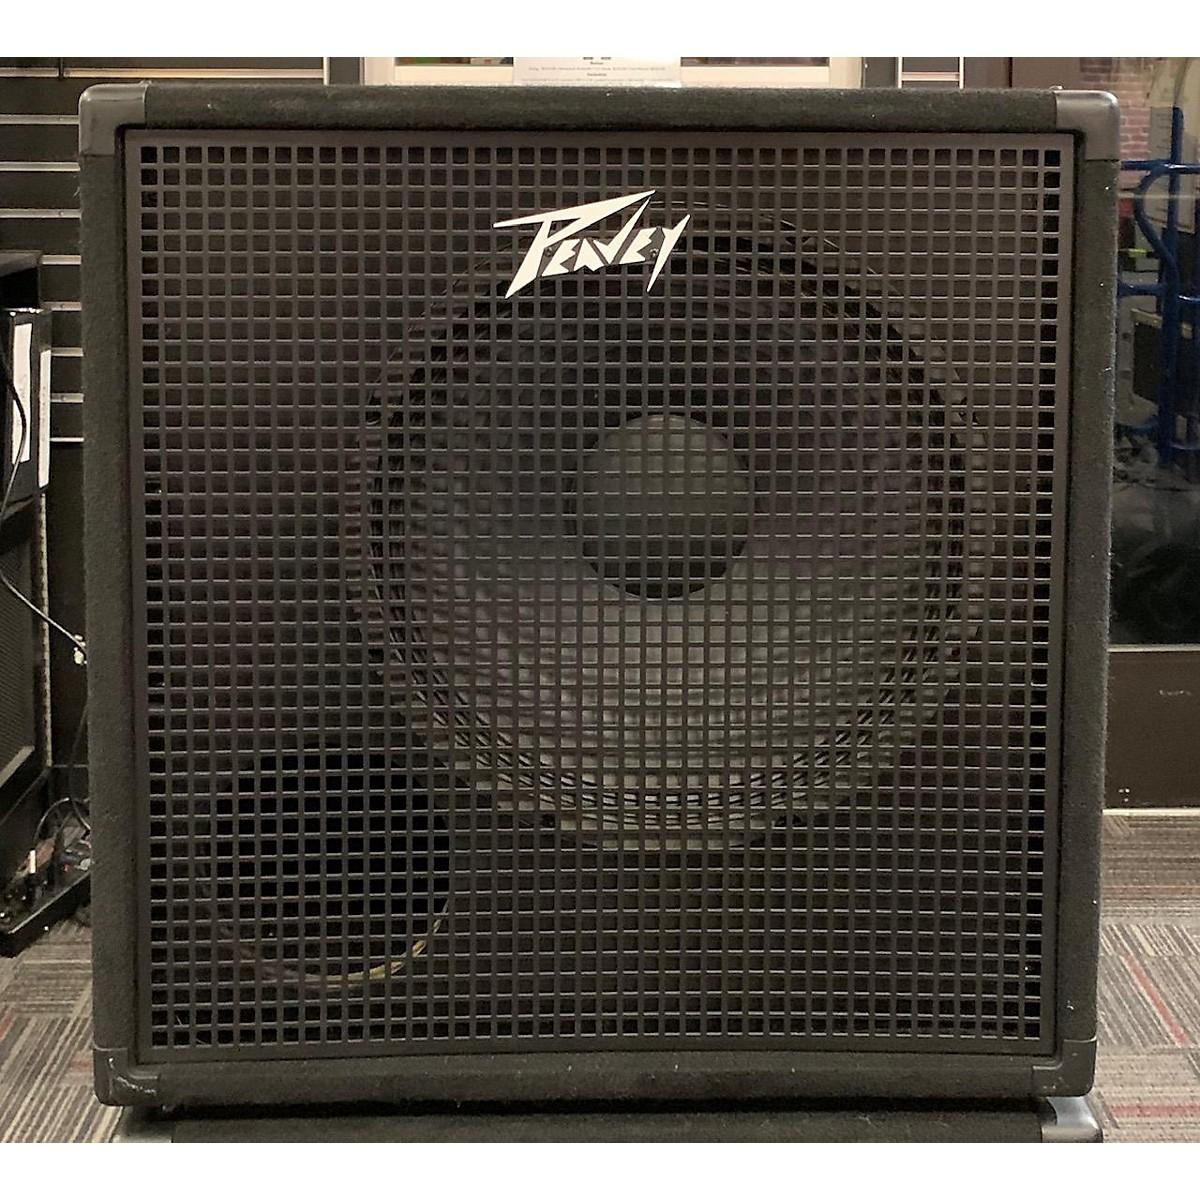 Peavey 2018 Headliner 115 Bass Cabinet